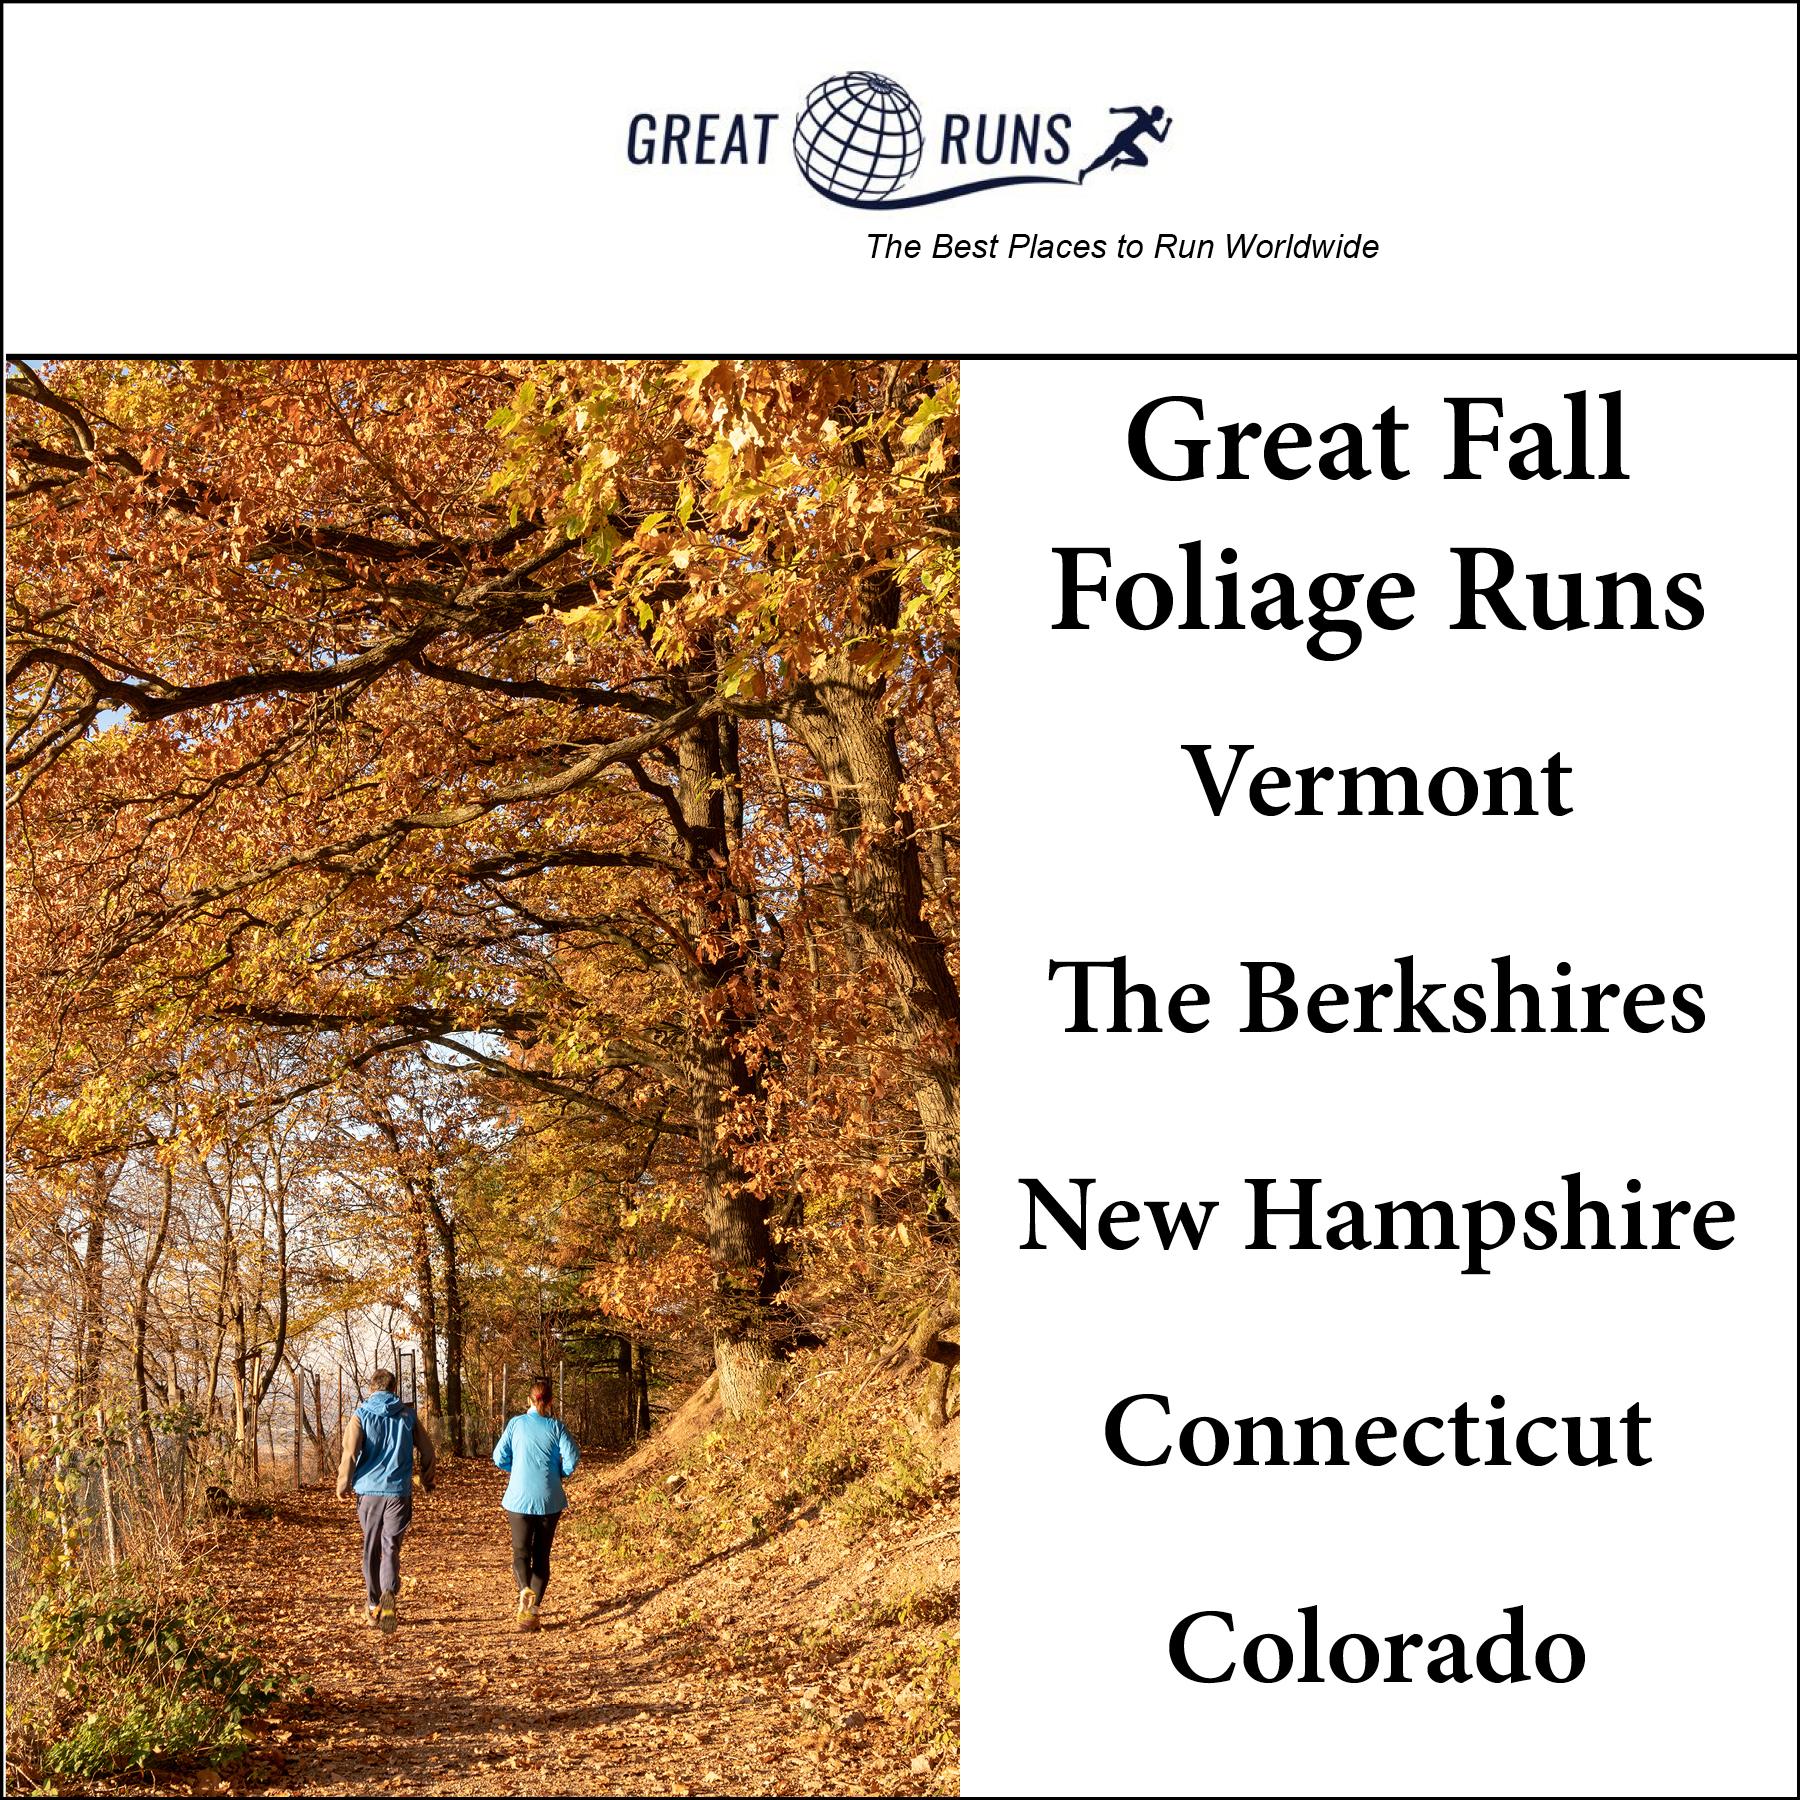 Great Fall Foliage Runs